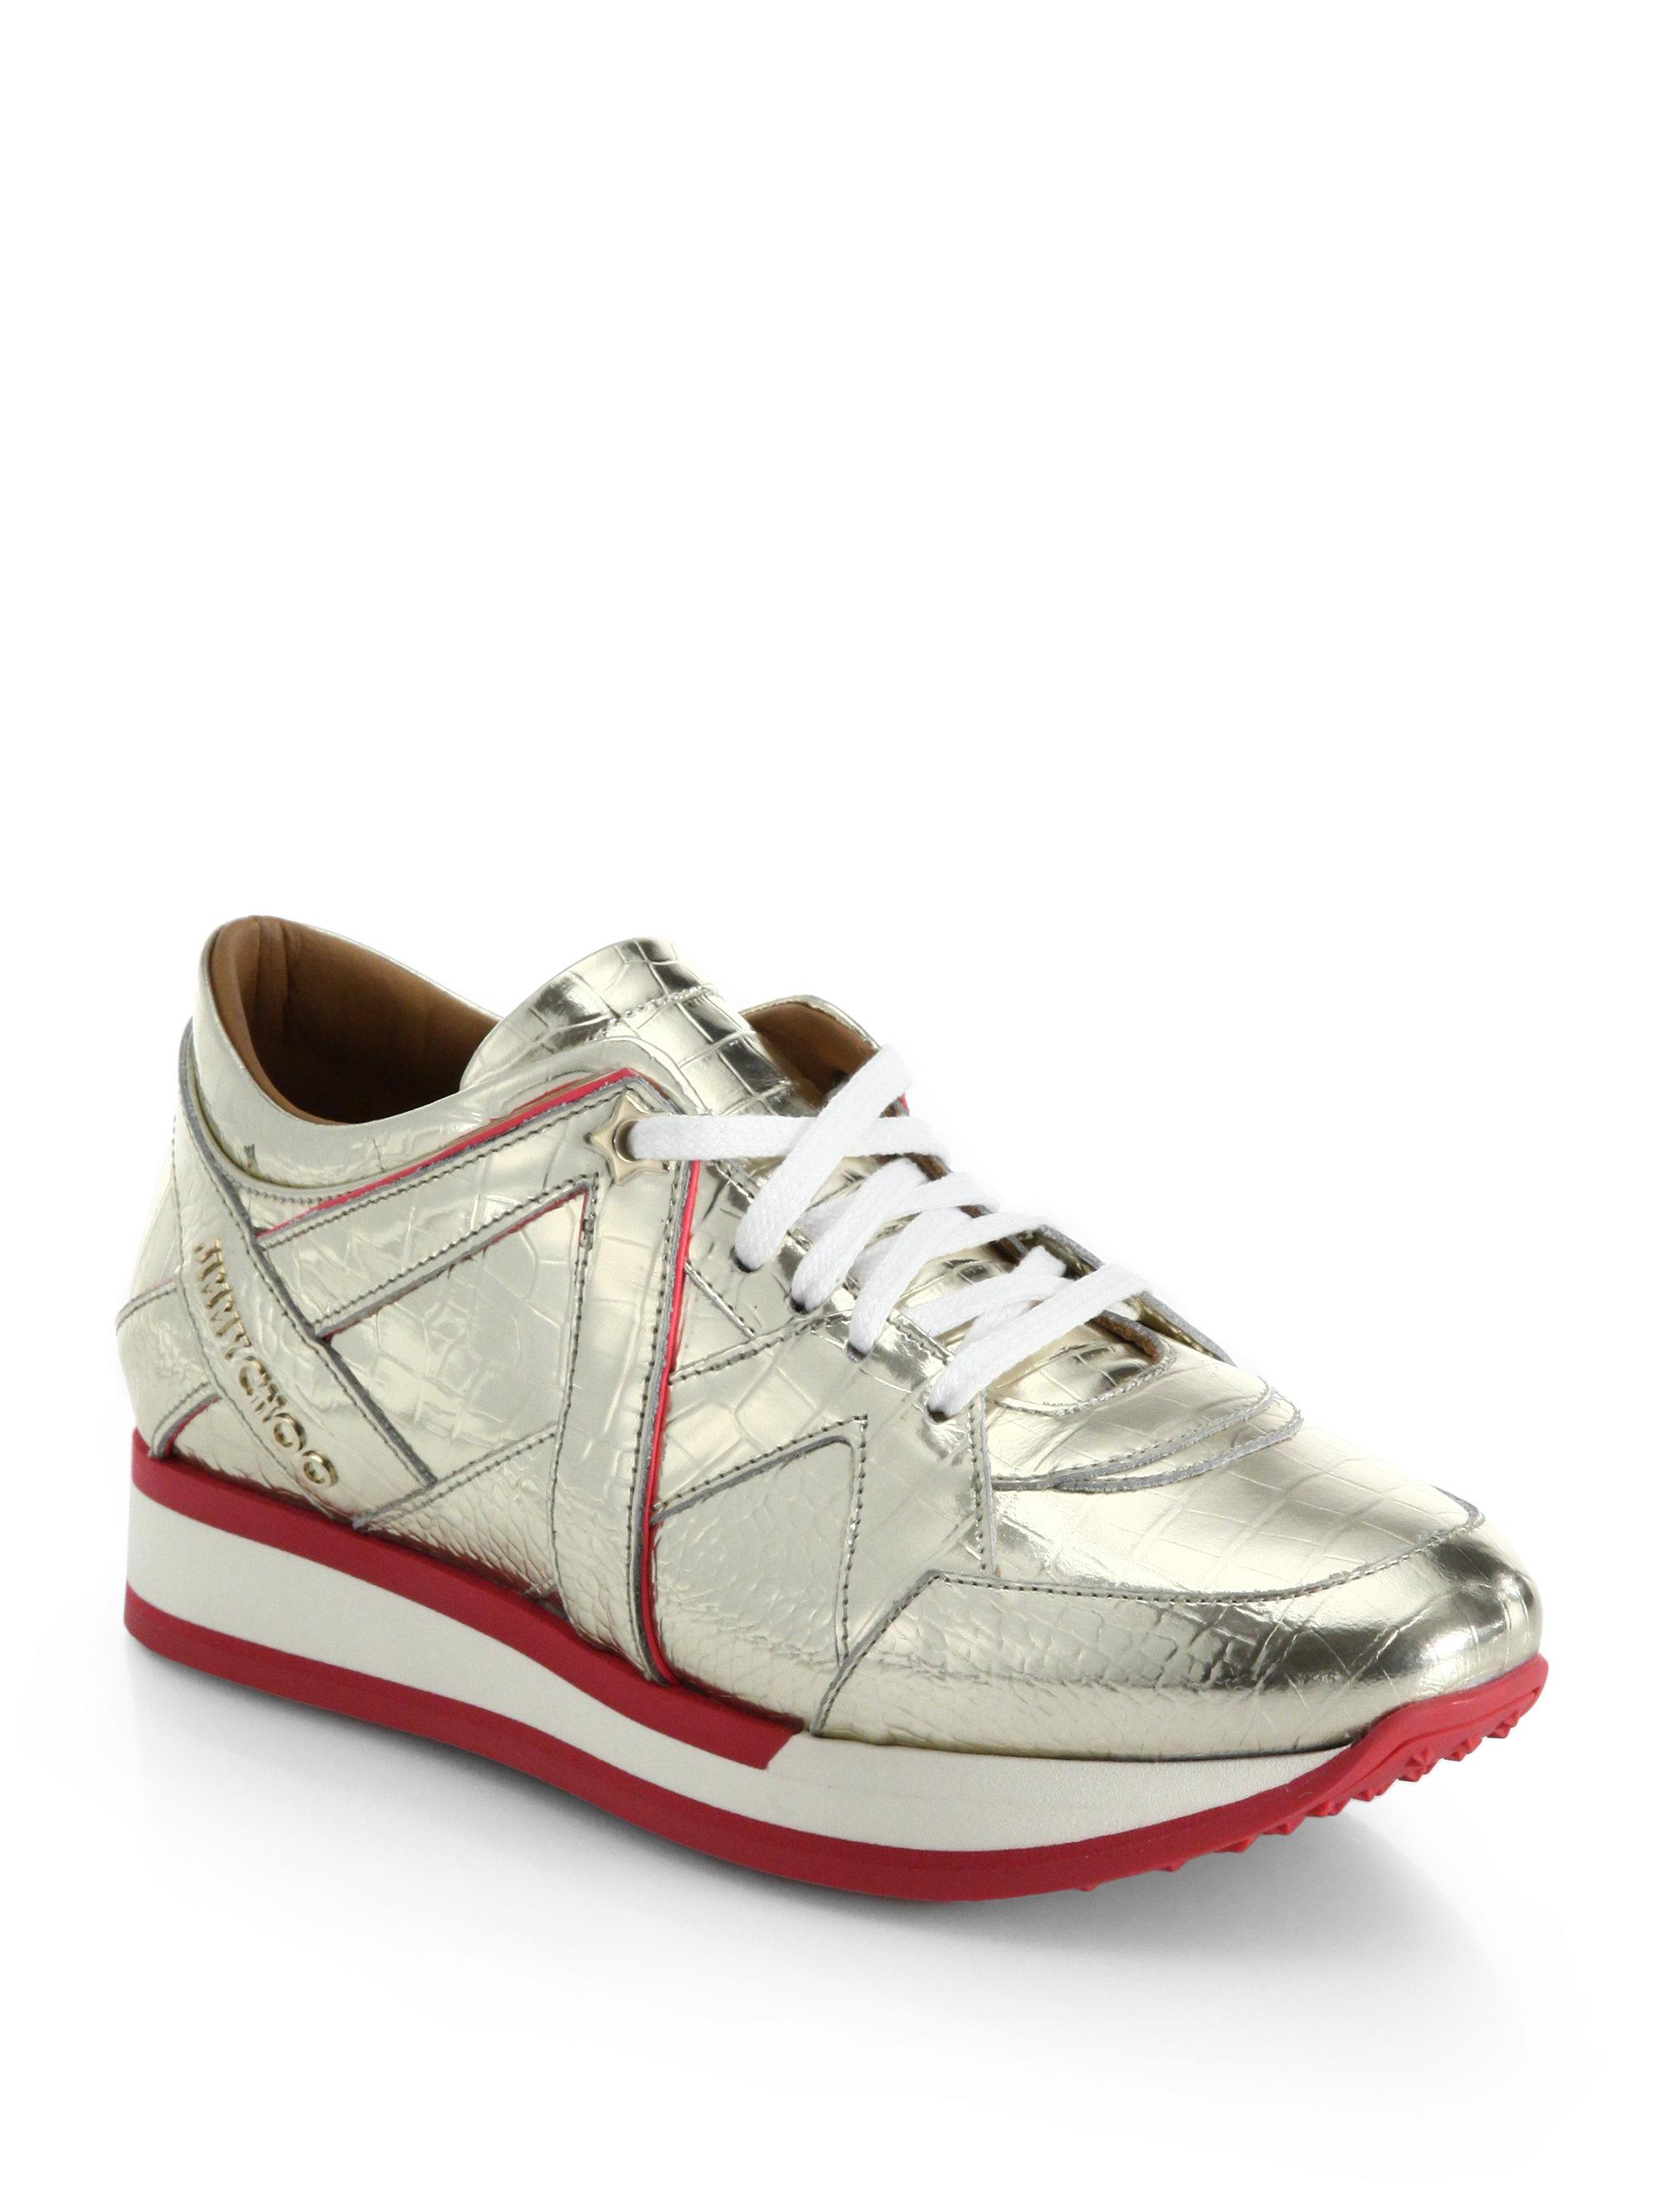 jimmy choo london sporty metallic leather sneakers in metallic lyst. Black Bedroom Furniture Sets. Home Design Ideas